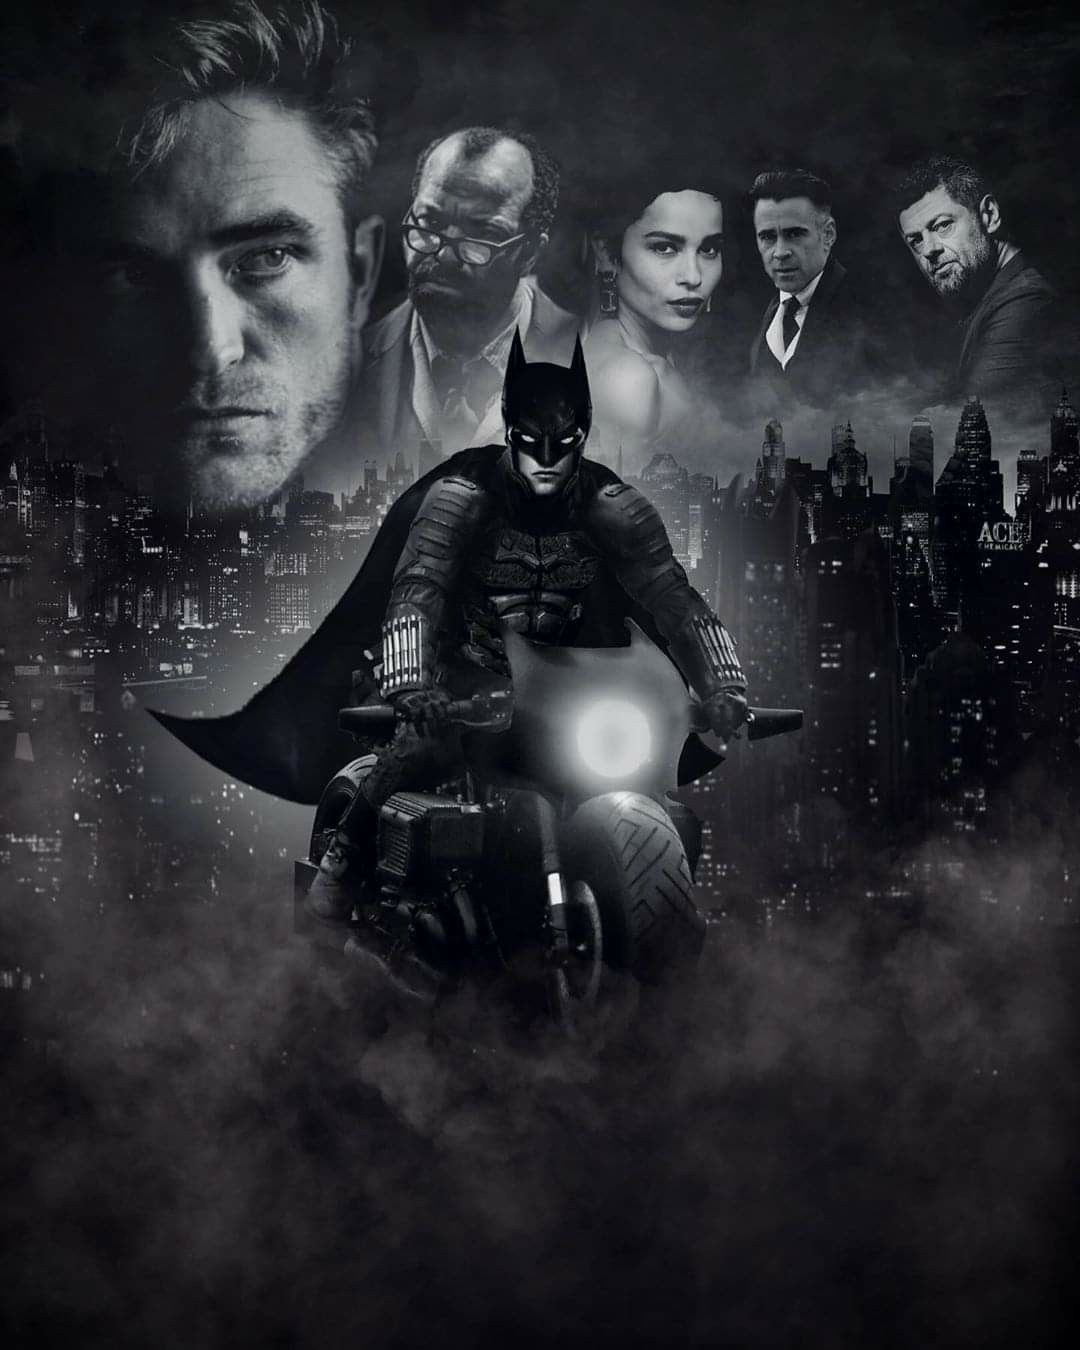 Pin By Red Vampire Woman Vampiress On Robert Pattinson Edward Cullen Twilight Saga V V In 2021 Batman Fan Poster Comic Books